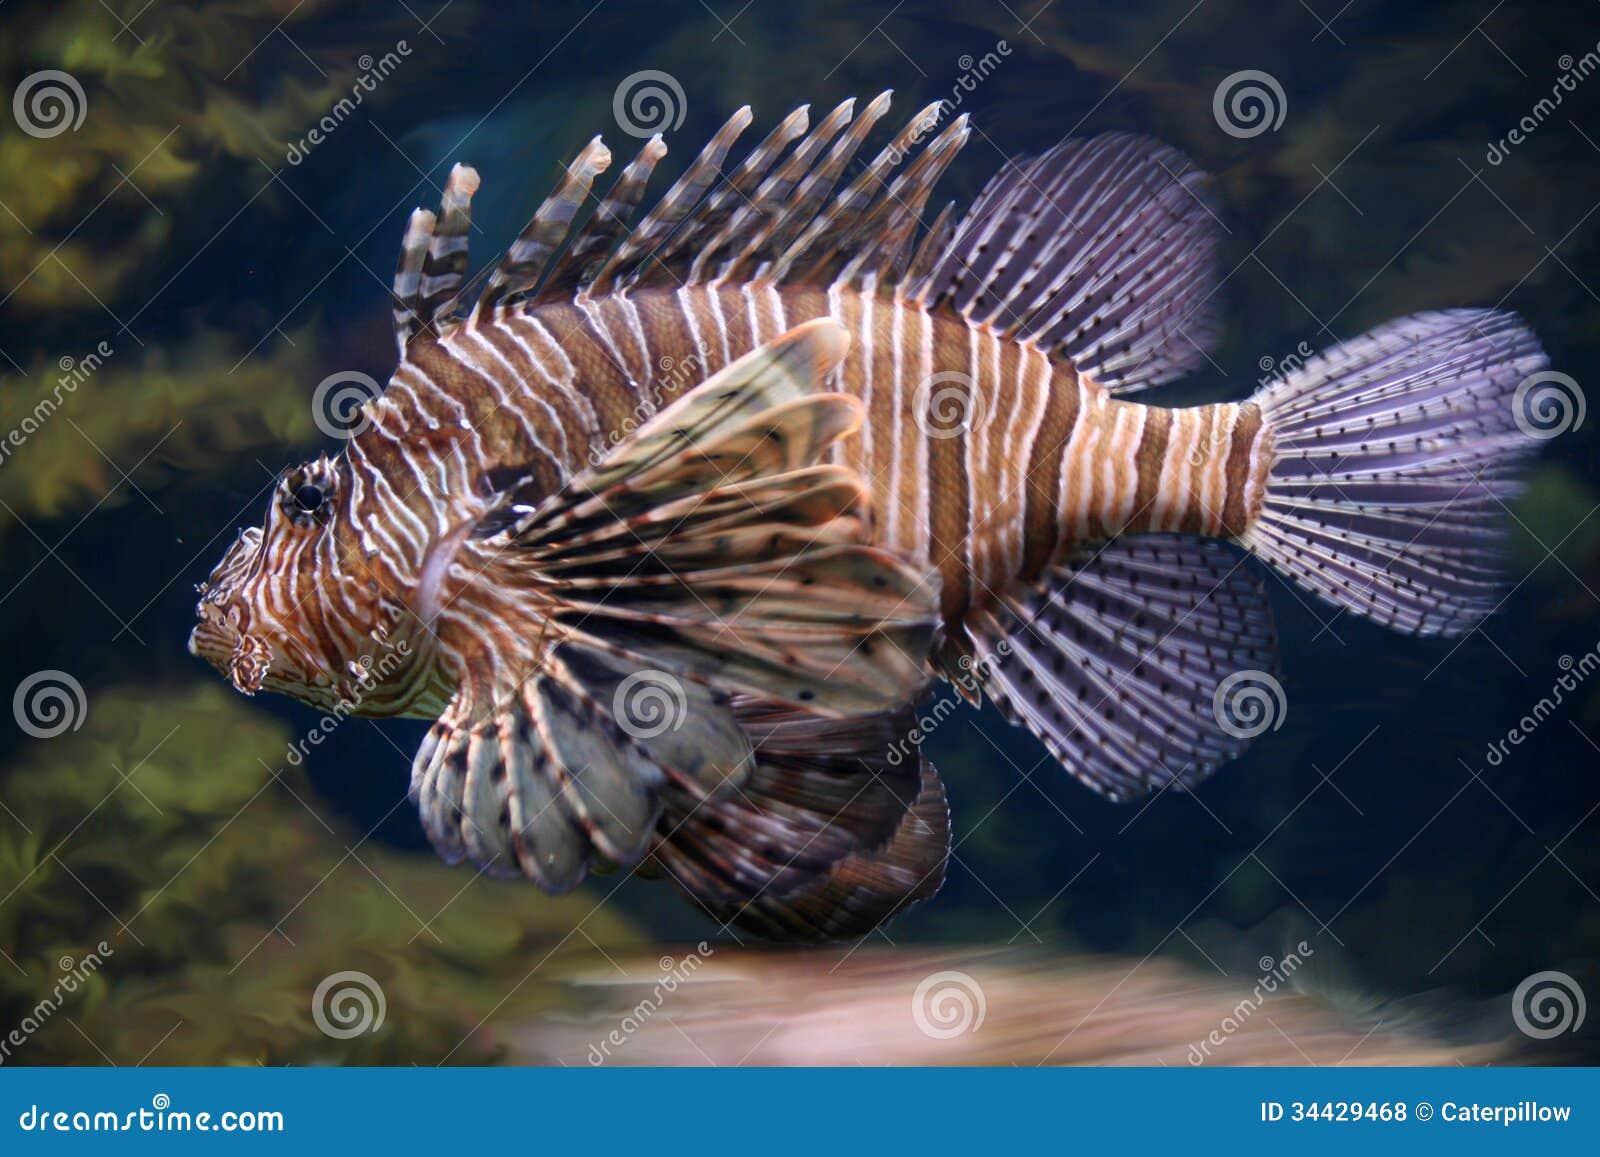 Ugly freshwater aquarium fish - Scorpion Fish Underwater Close Up Royalty Free Stock Photos